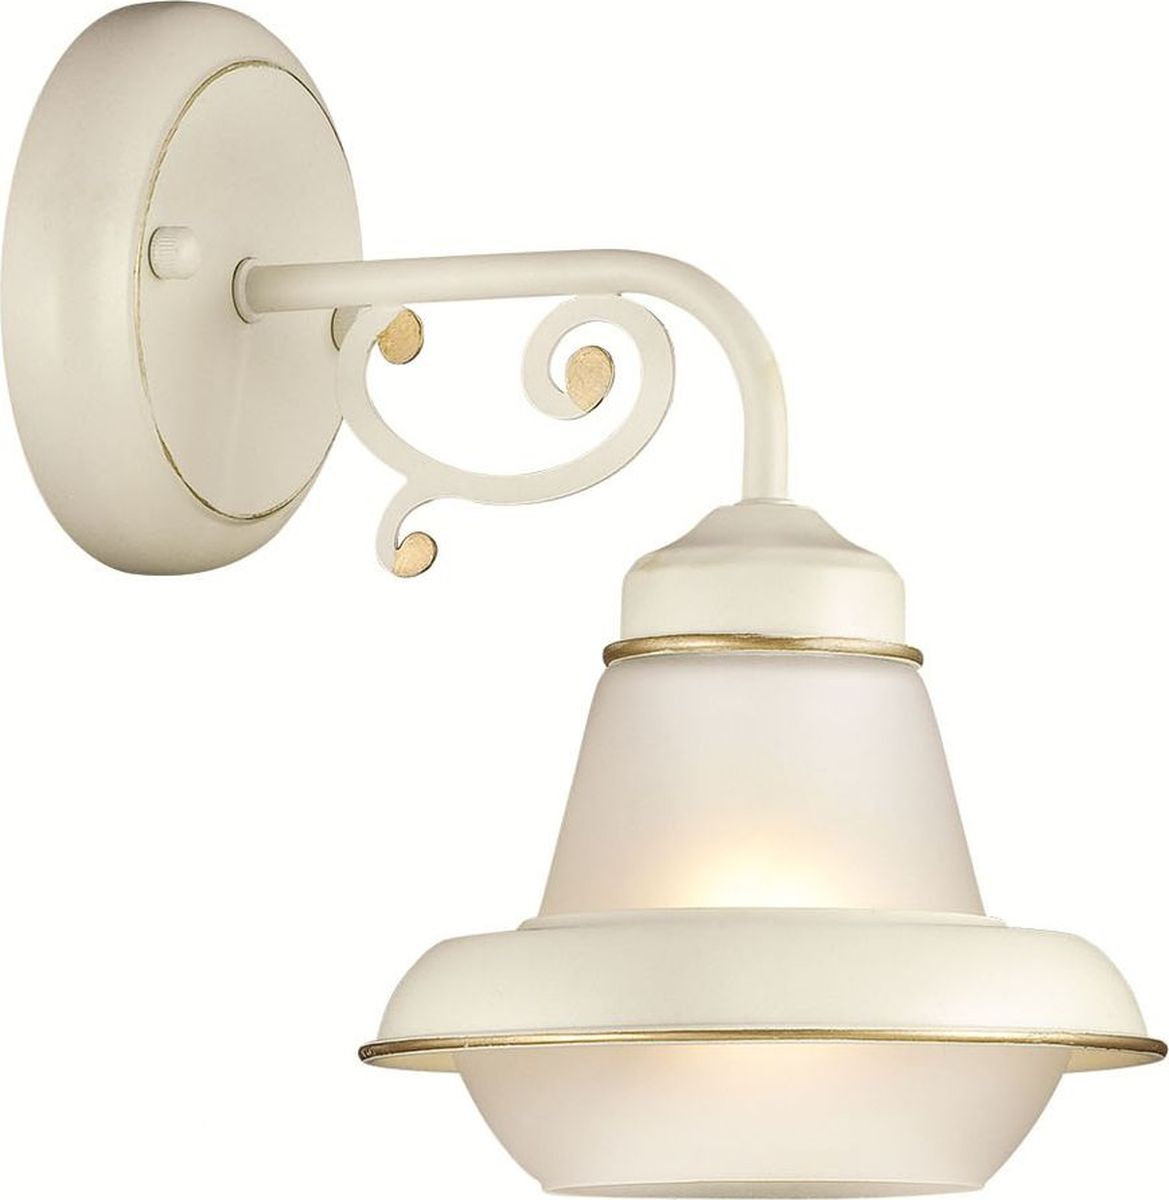 Бра Lumion Tefida, цвет: белый, E27, 60 Вт. 3105/1W3105/1W